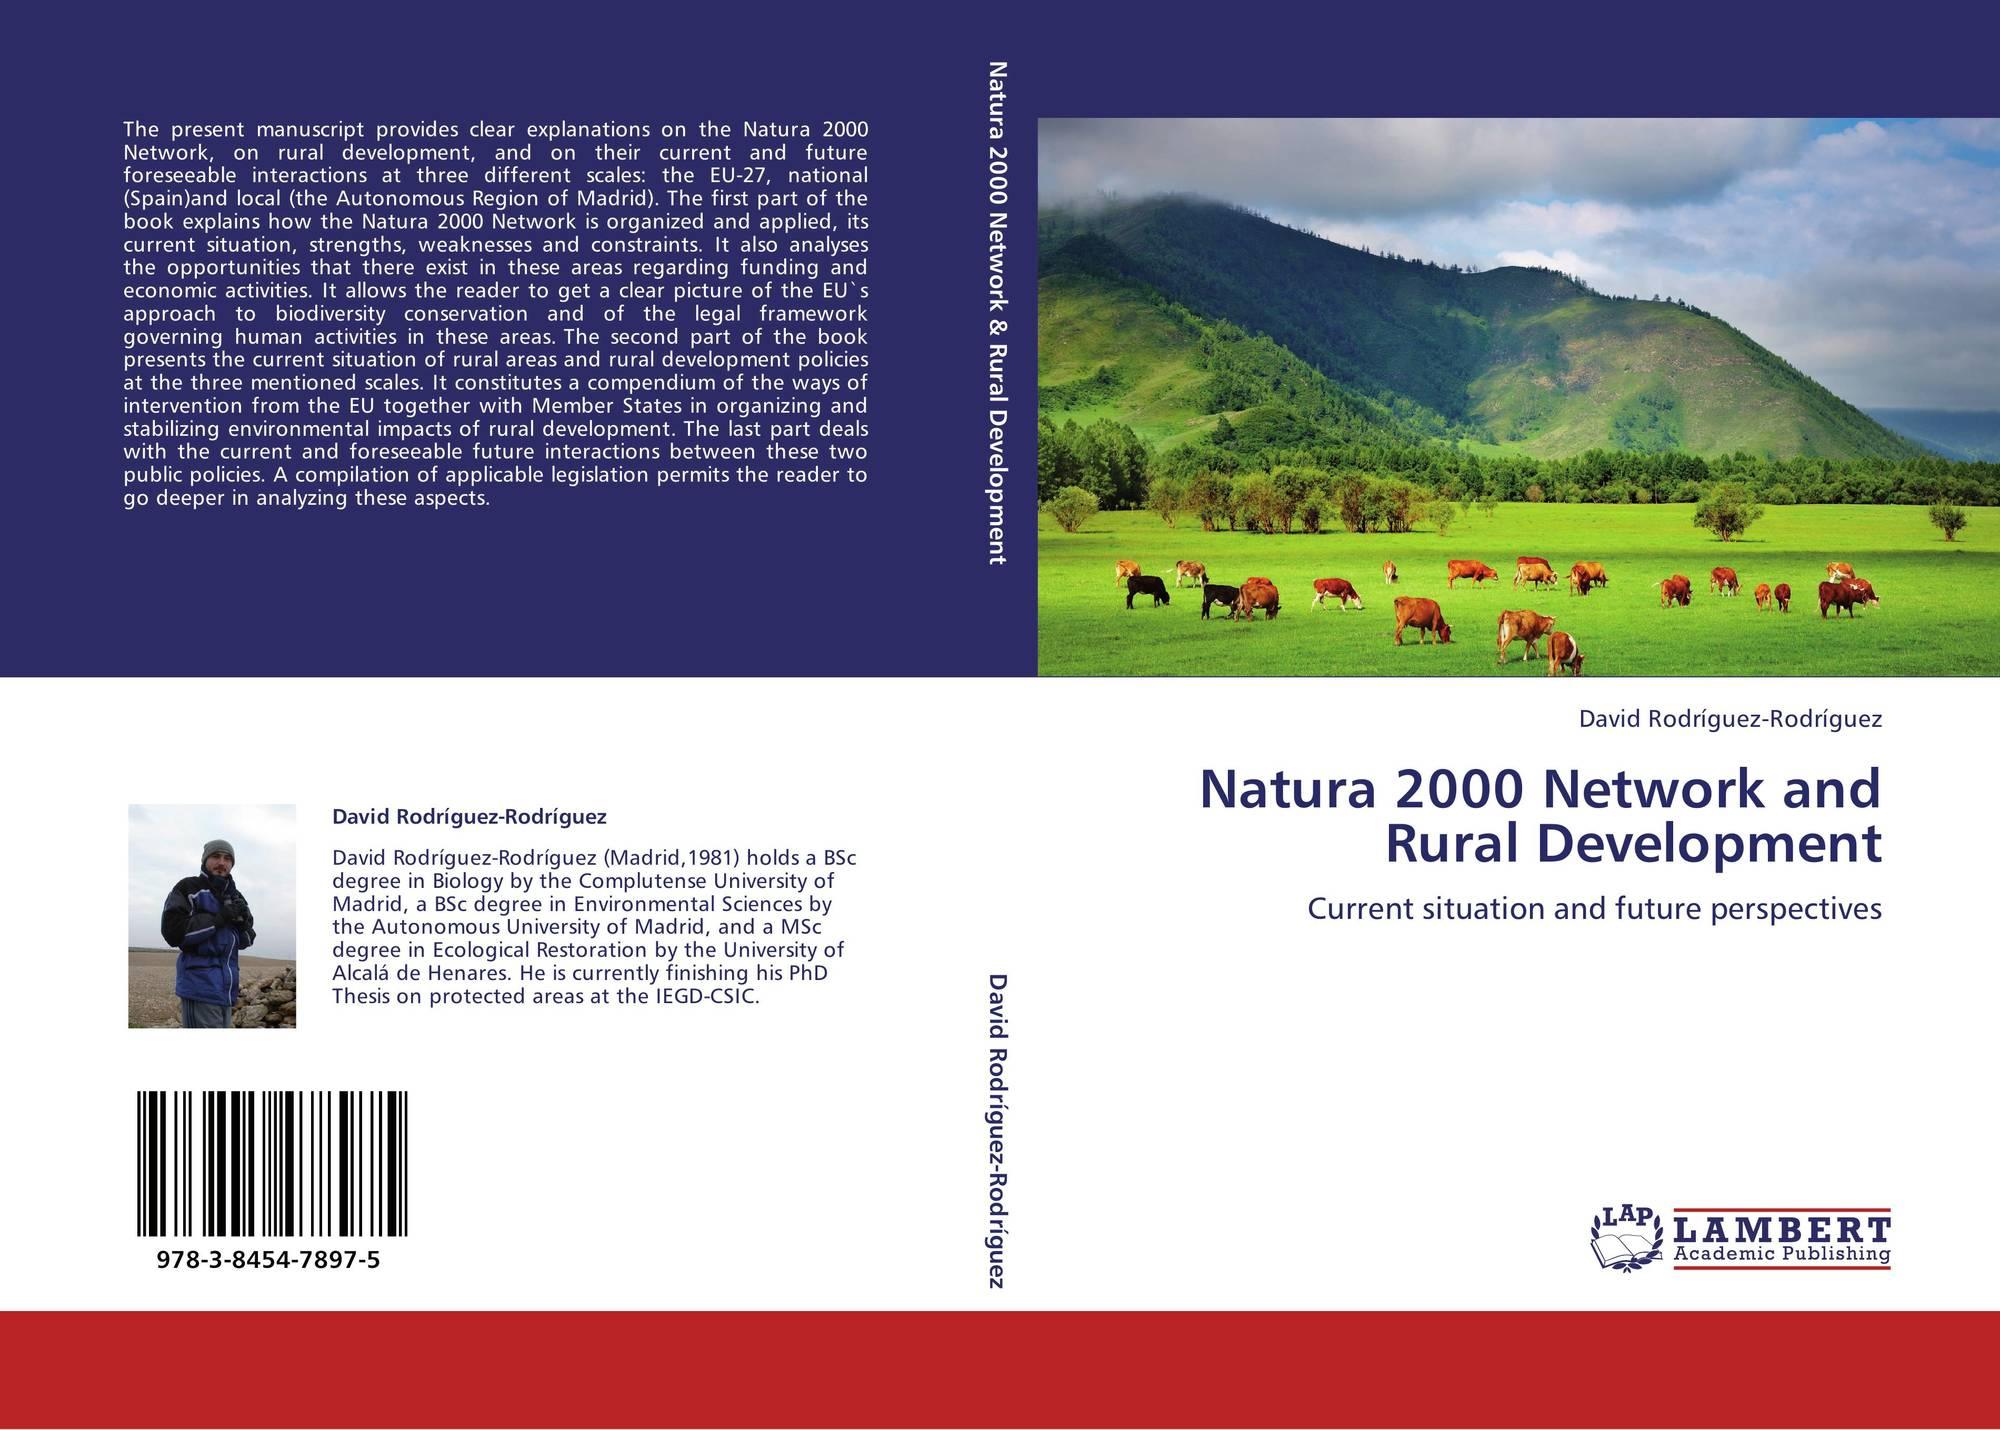 Natura 2000 Network and Rural Development, 978-3-8454-7897-5